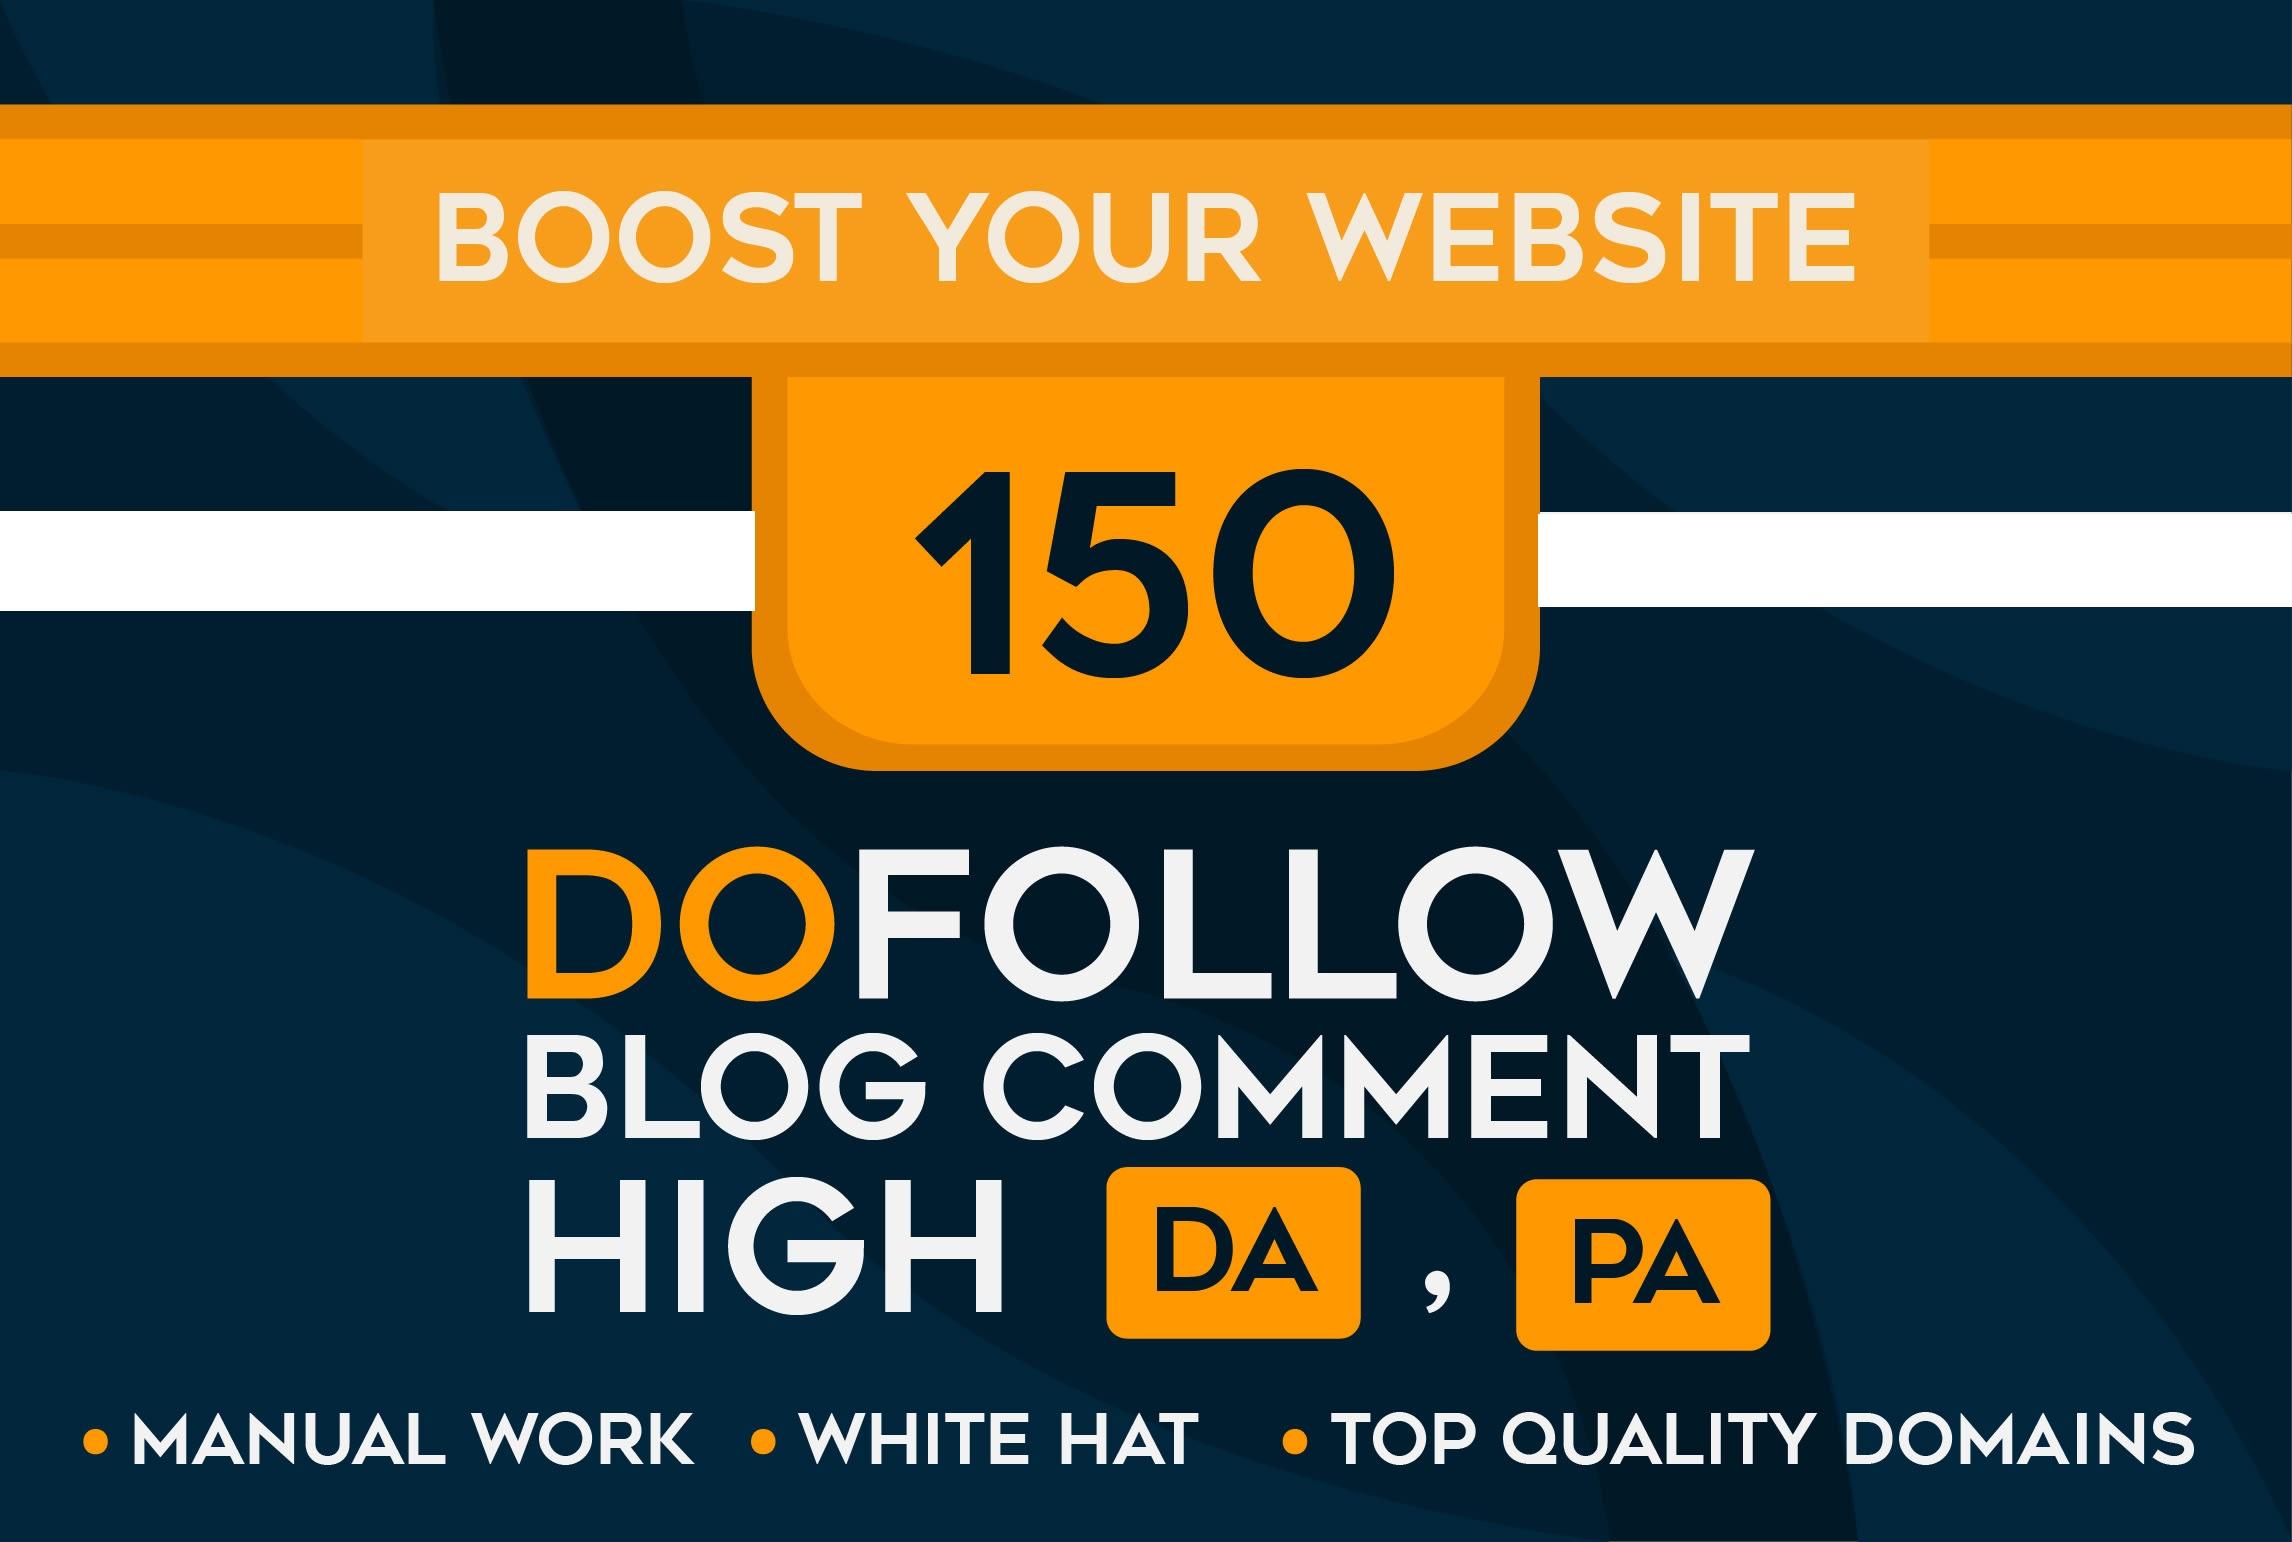 I will Create 150 dofollow manual high da pa blog commenting